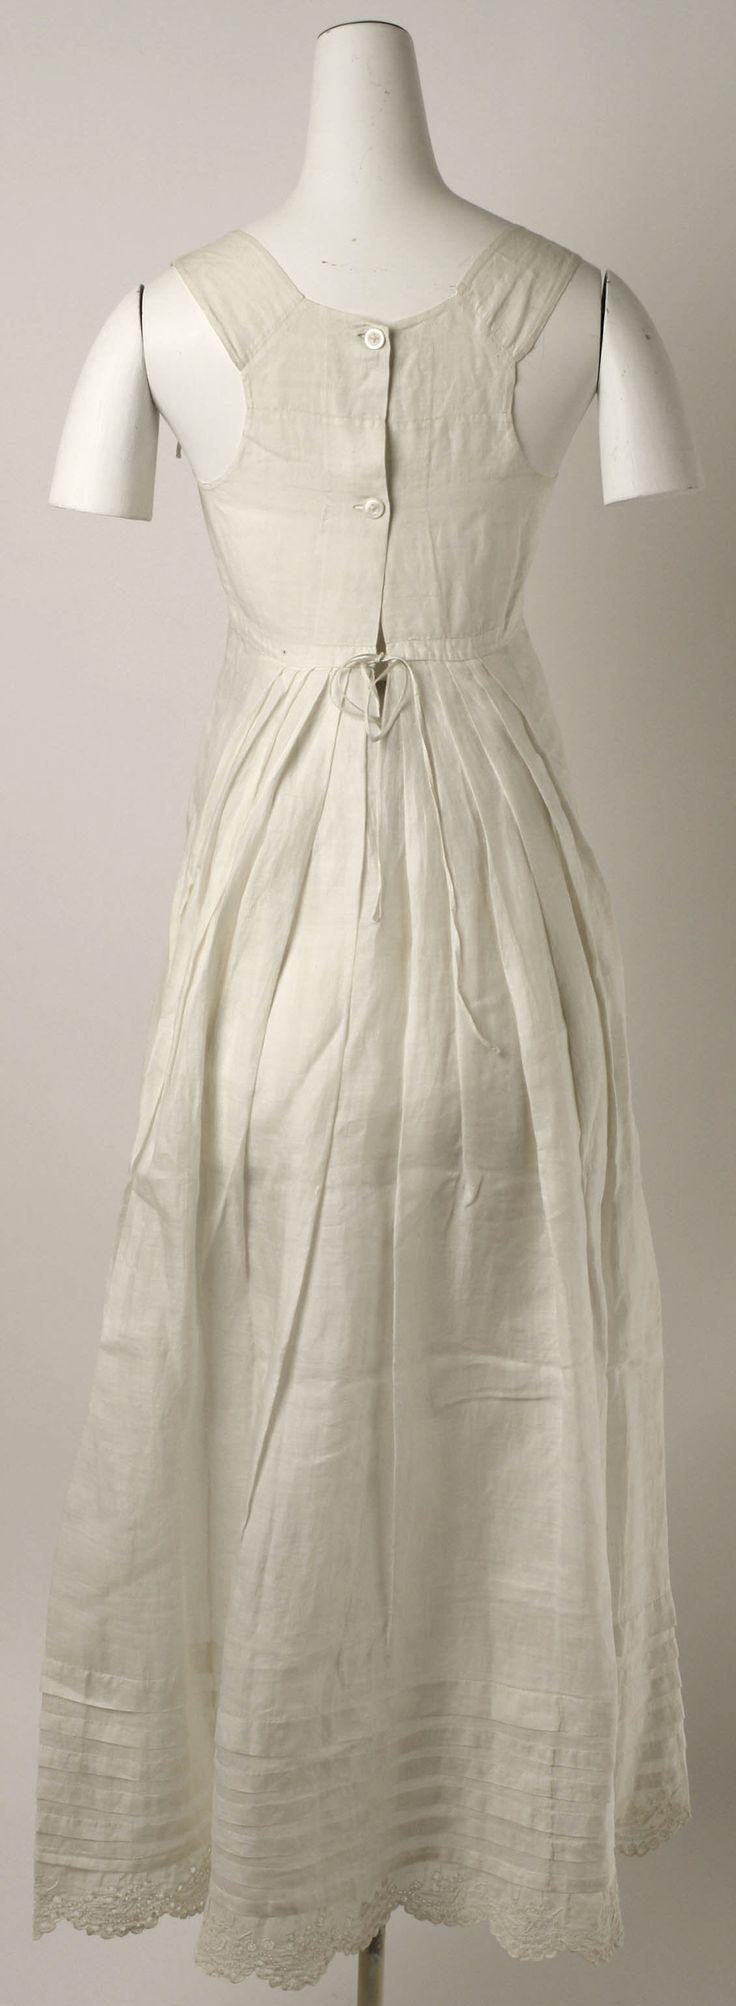 Petticoat: ca. early 19th century, American, linen.